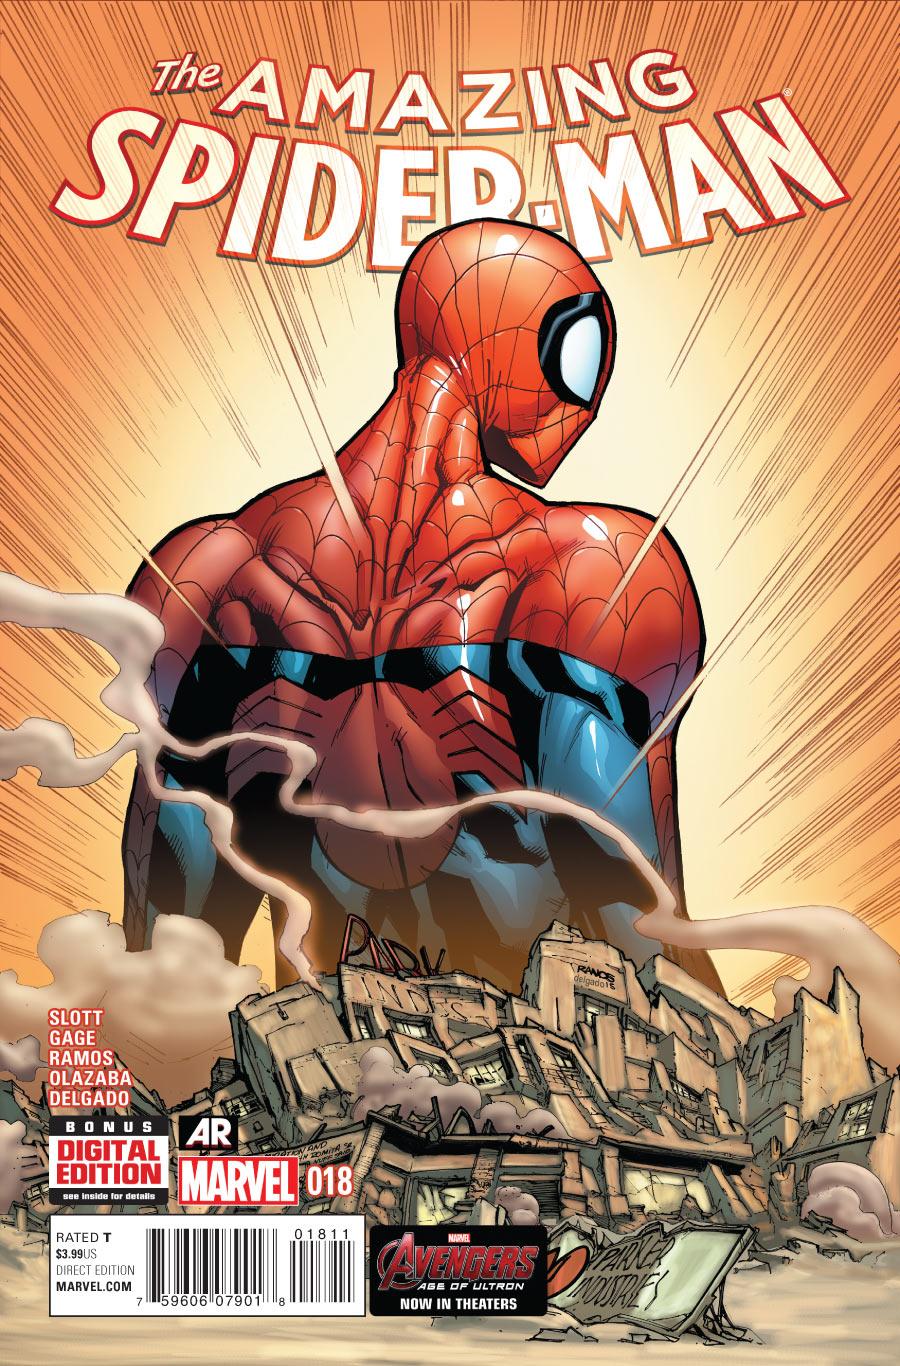 The Amazing Spider-Man #18